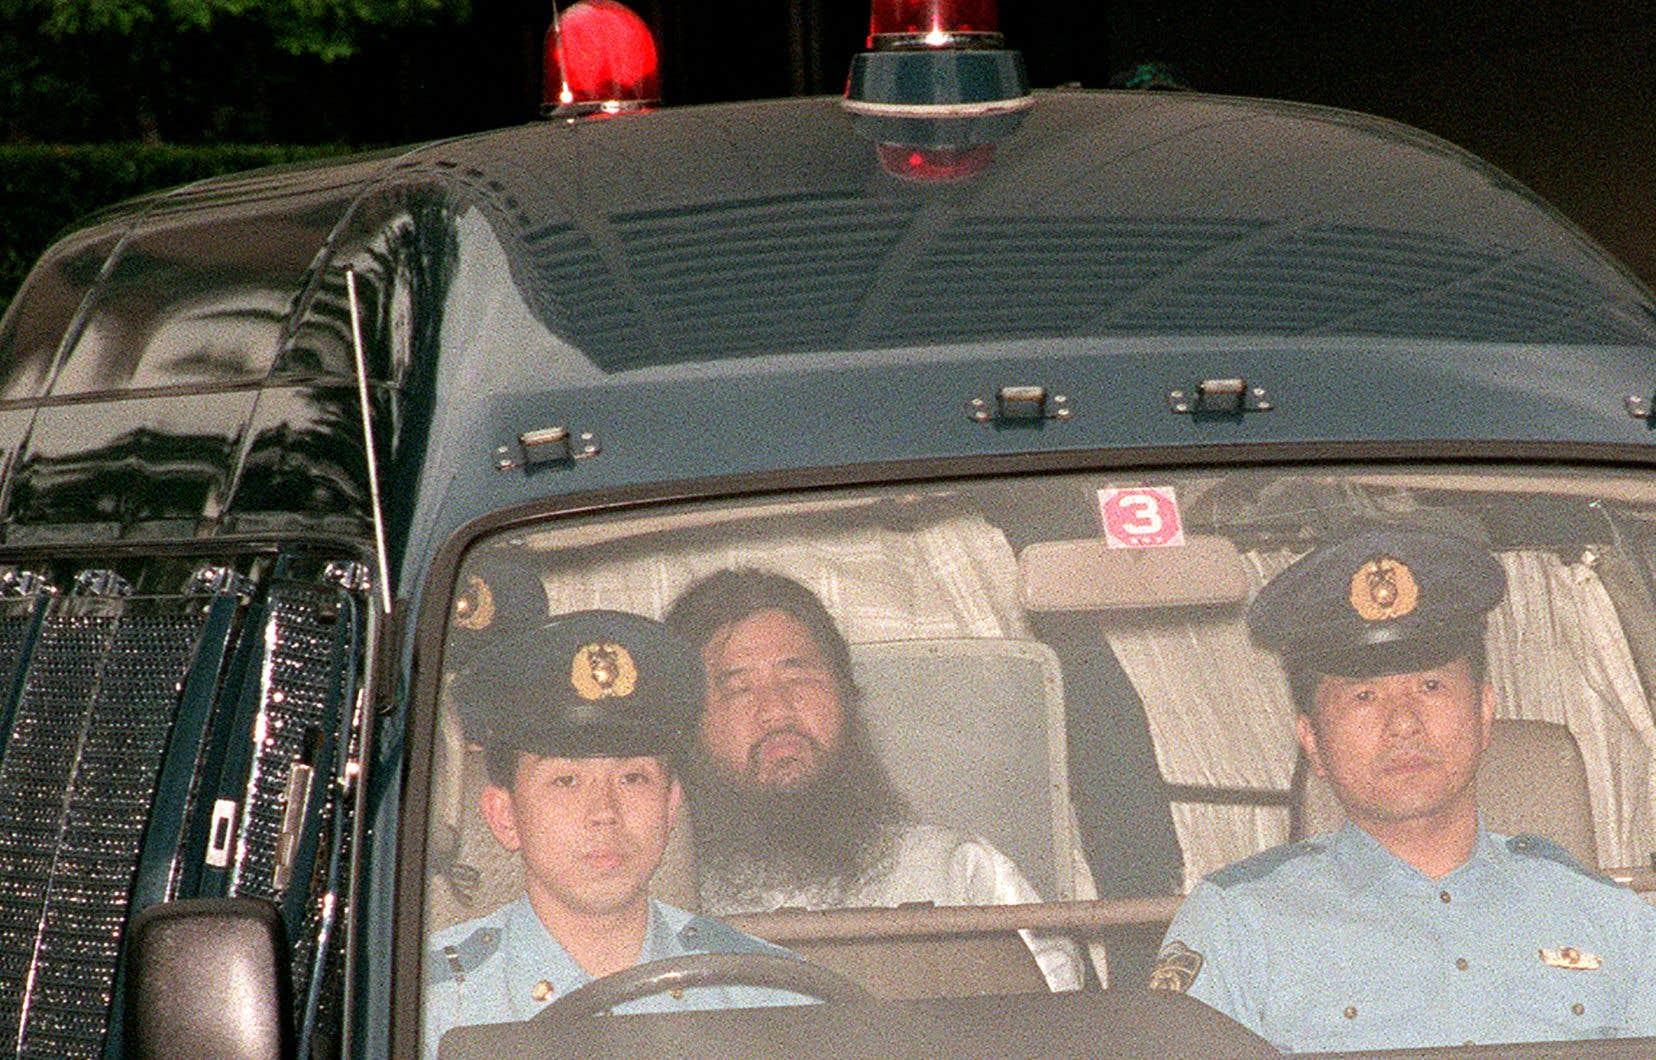 Shoko Asahara escorté par des policiers en juillet 1995